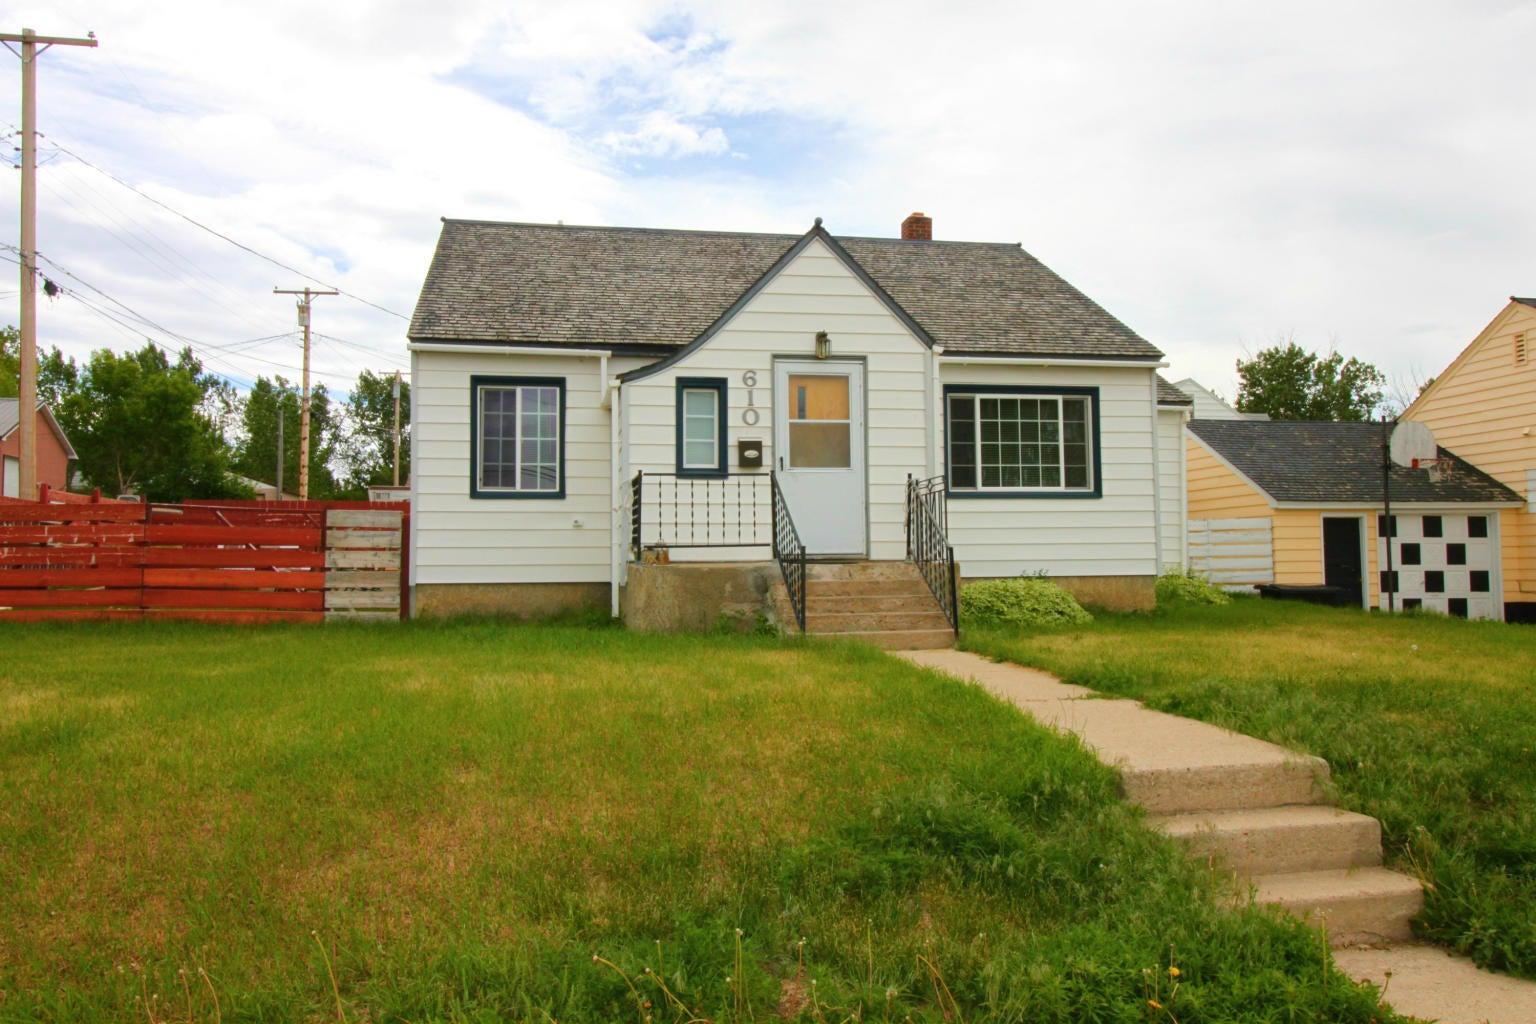 610 1st Street S E, Cut Bank, MT 59427